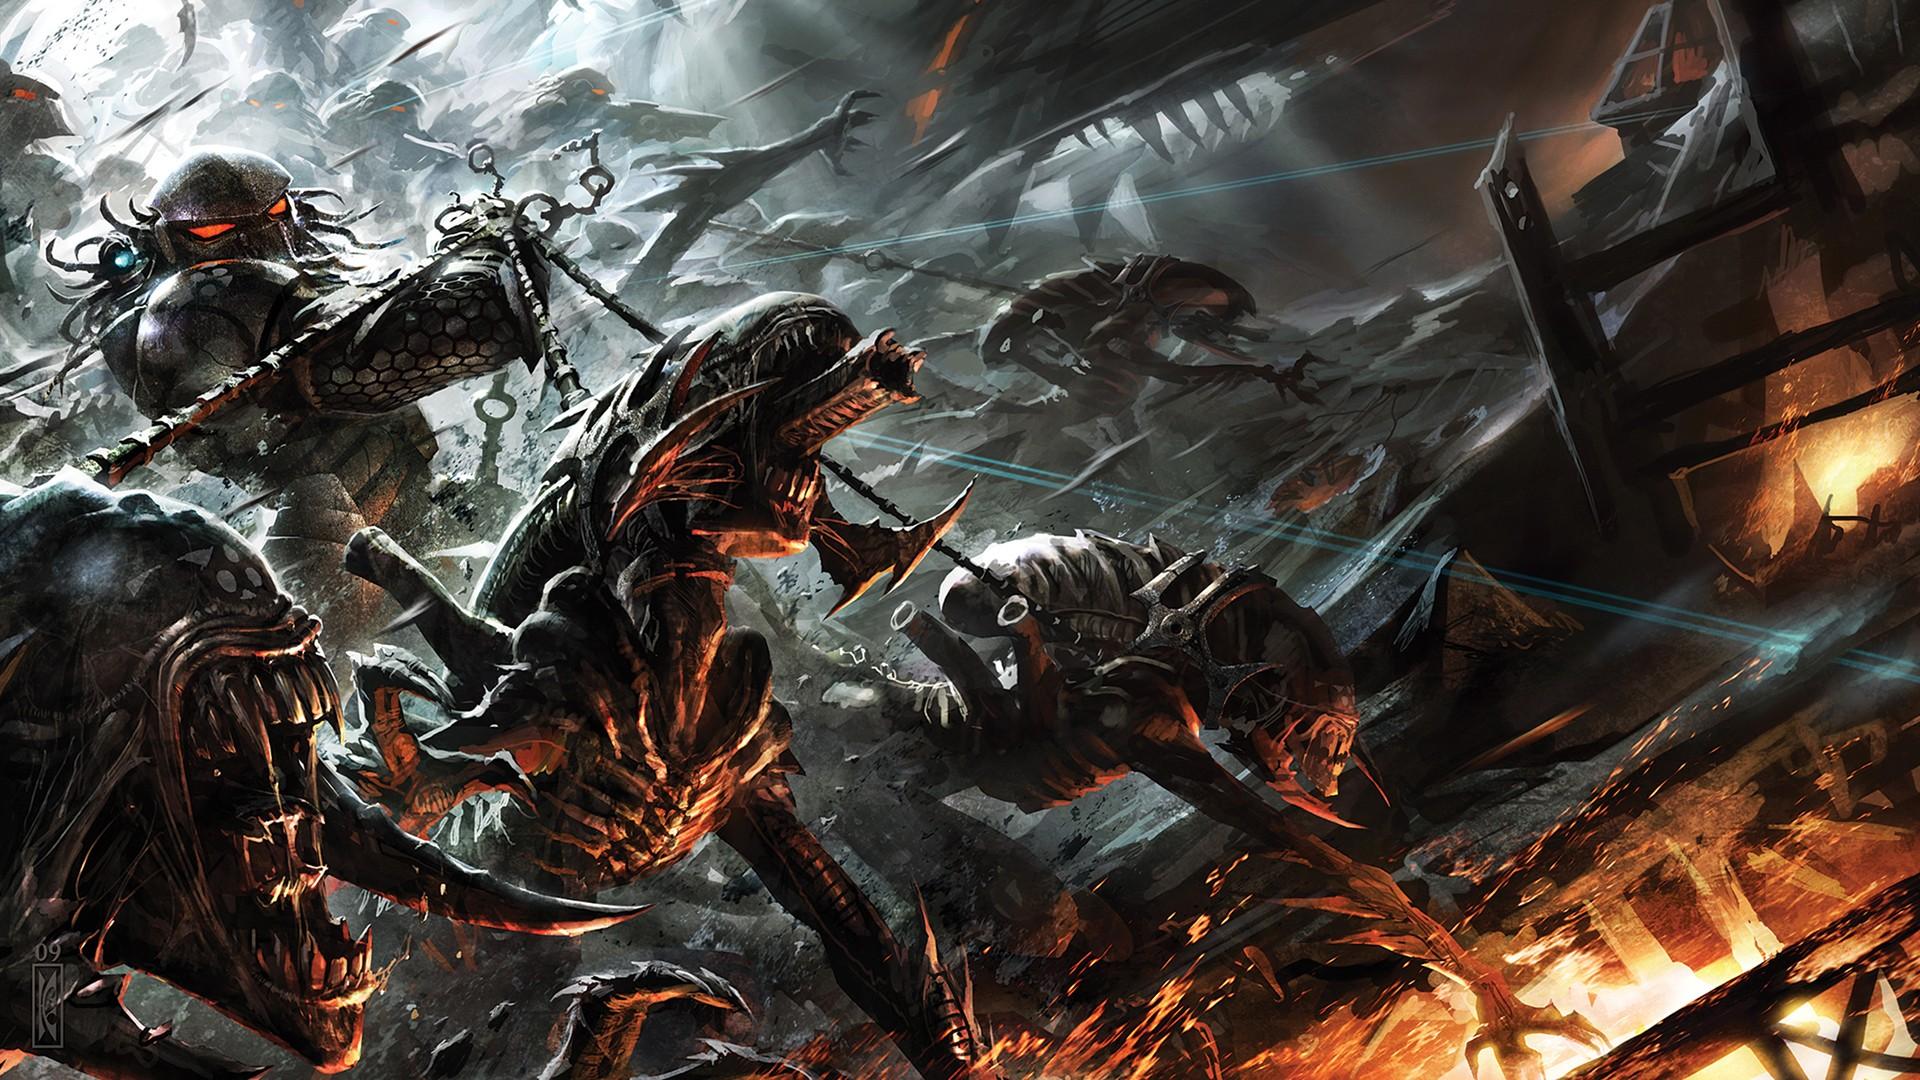 Aliens Vs Predator Three World War Full HD Wallpaper And